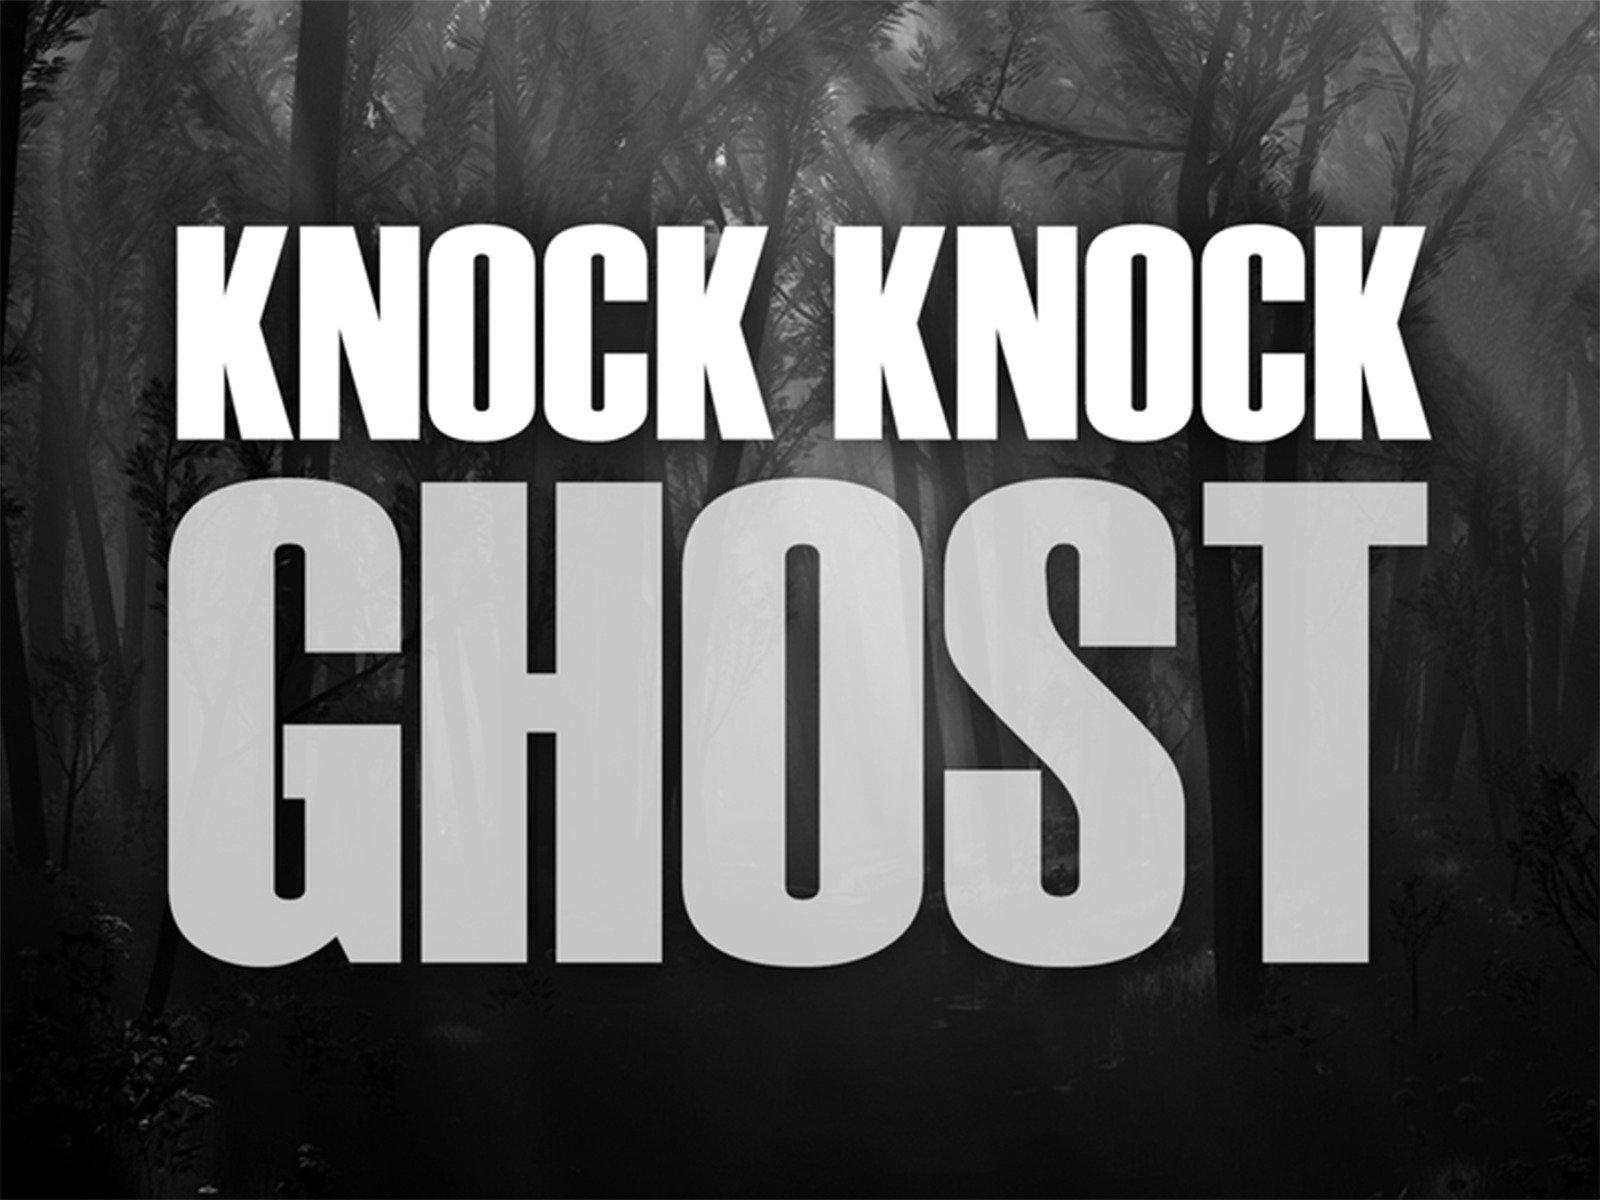 Knock Knock Ghost on Amazon Prime Video UK